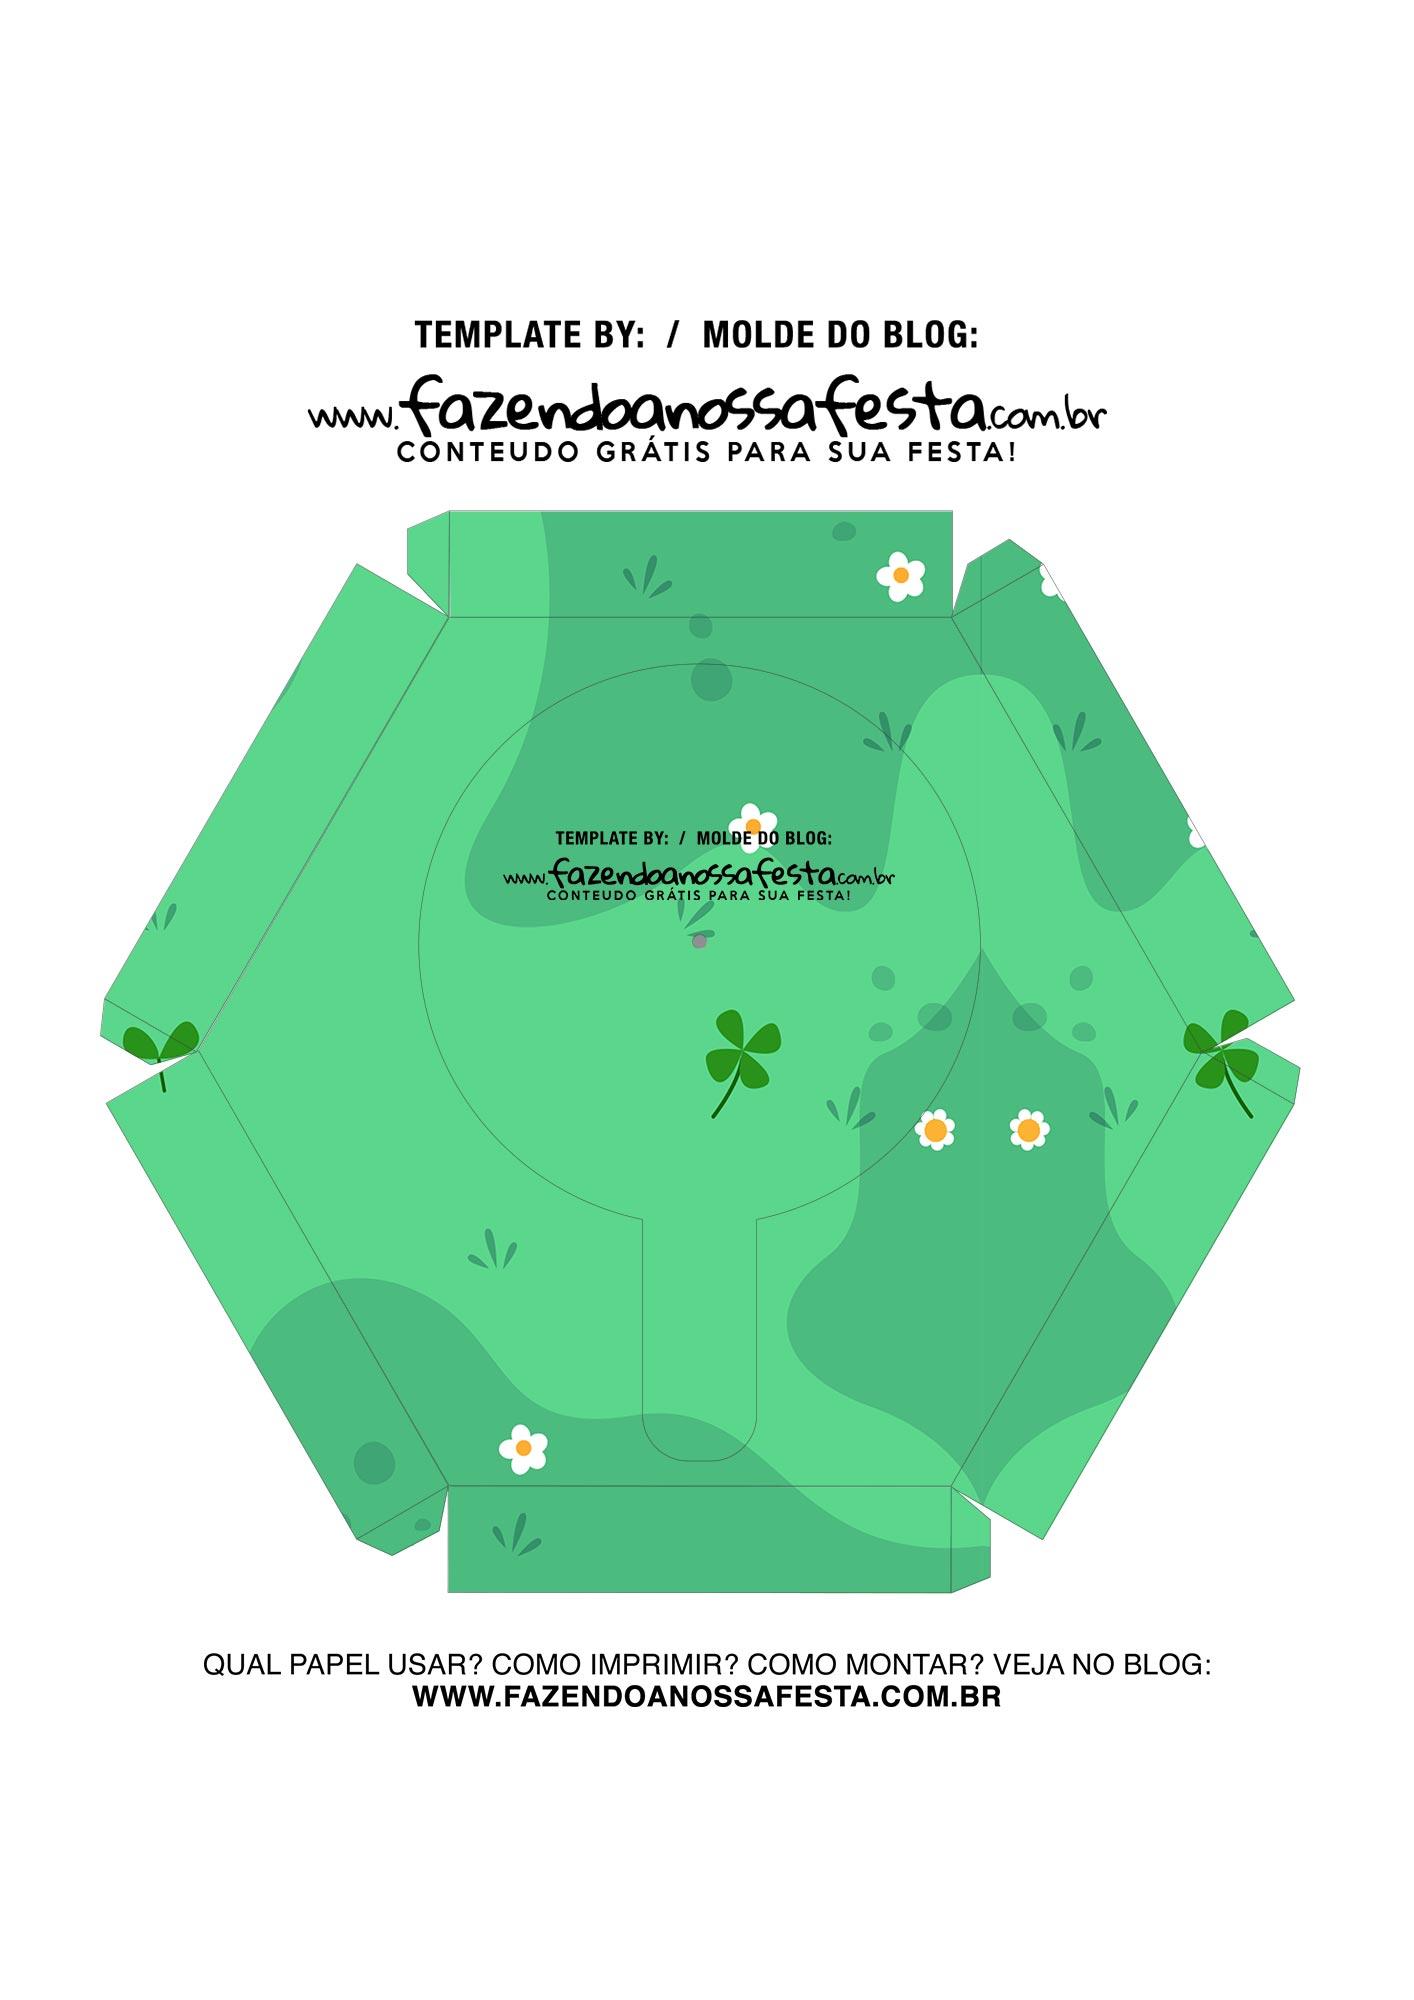 Caixa Explosiva Dia das Criancas Verde 7